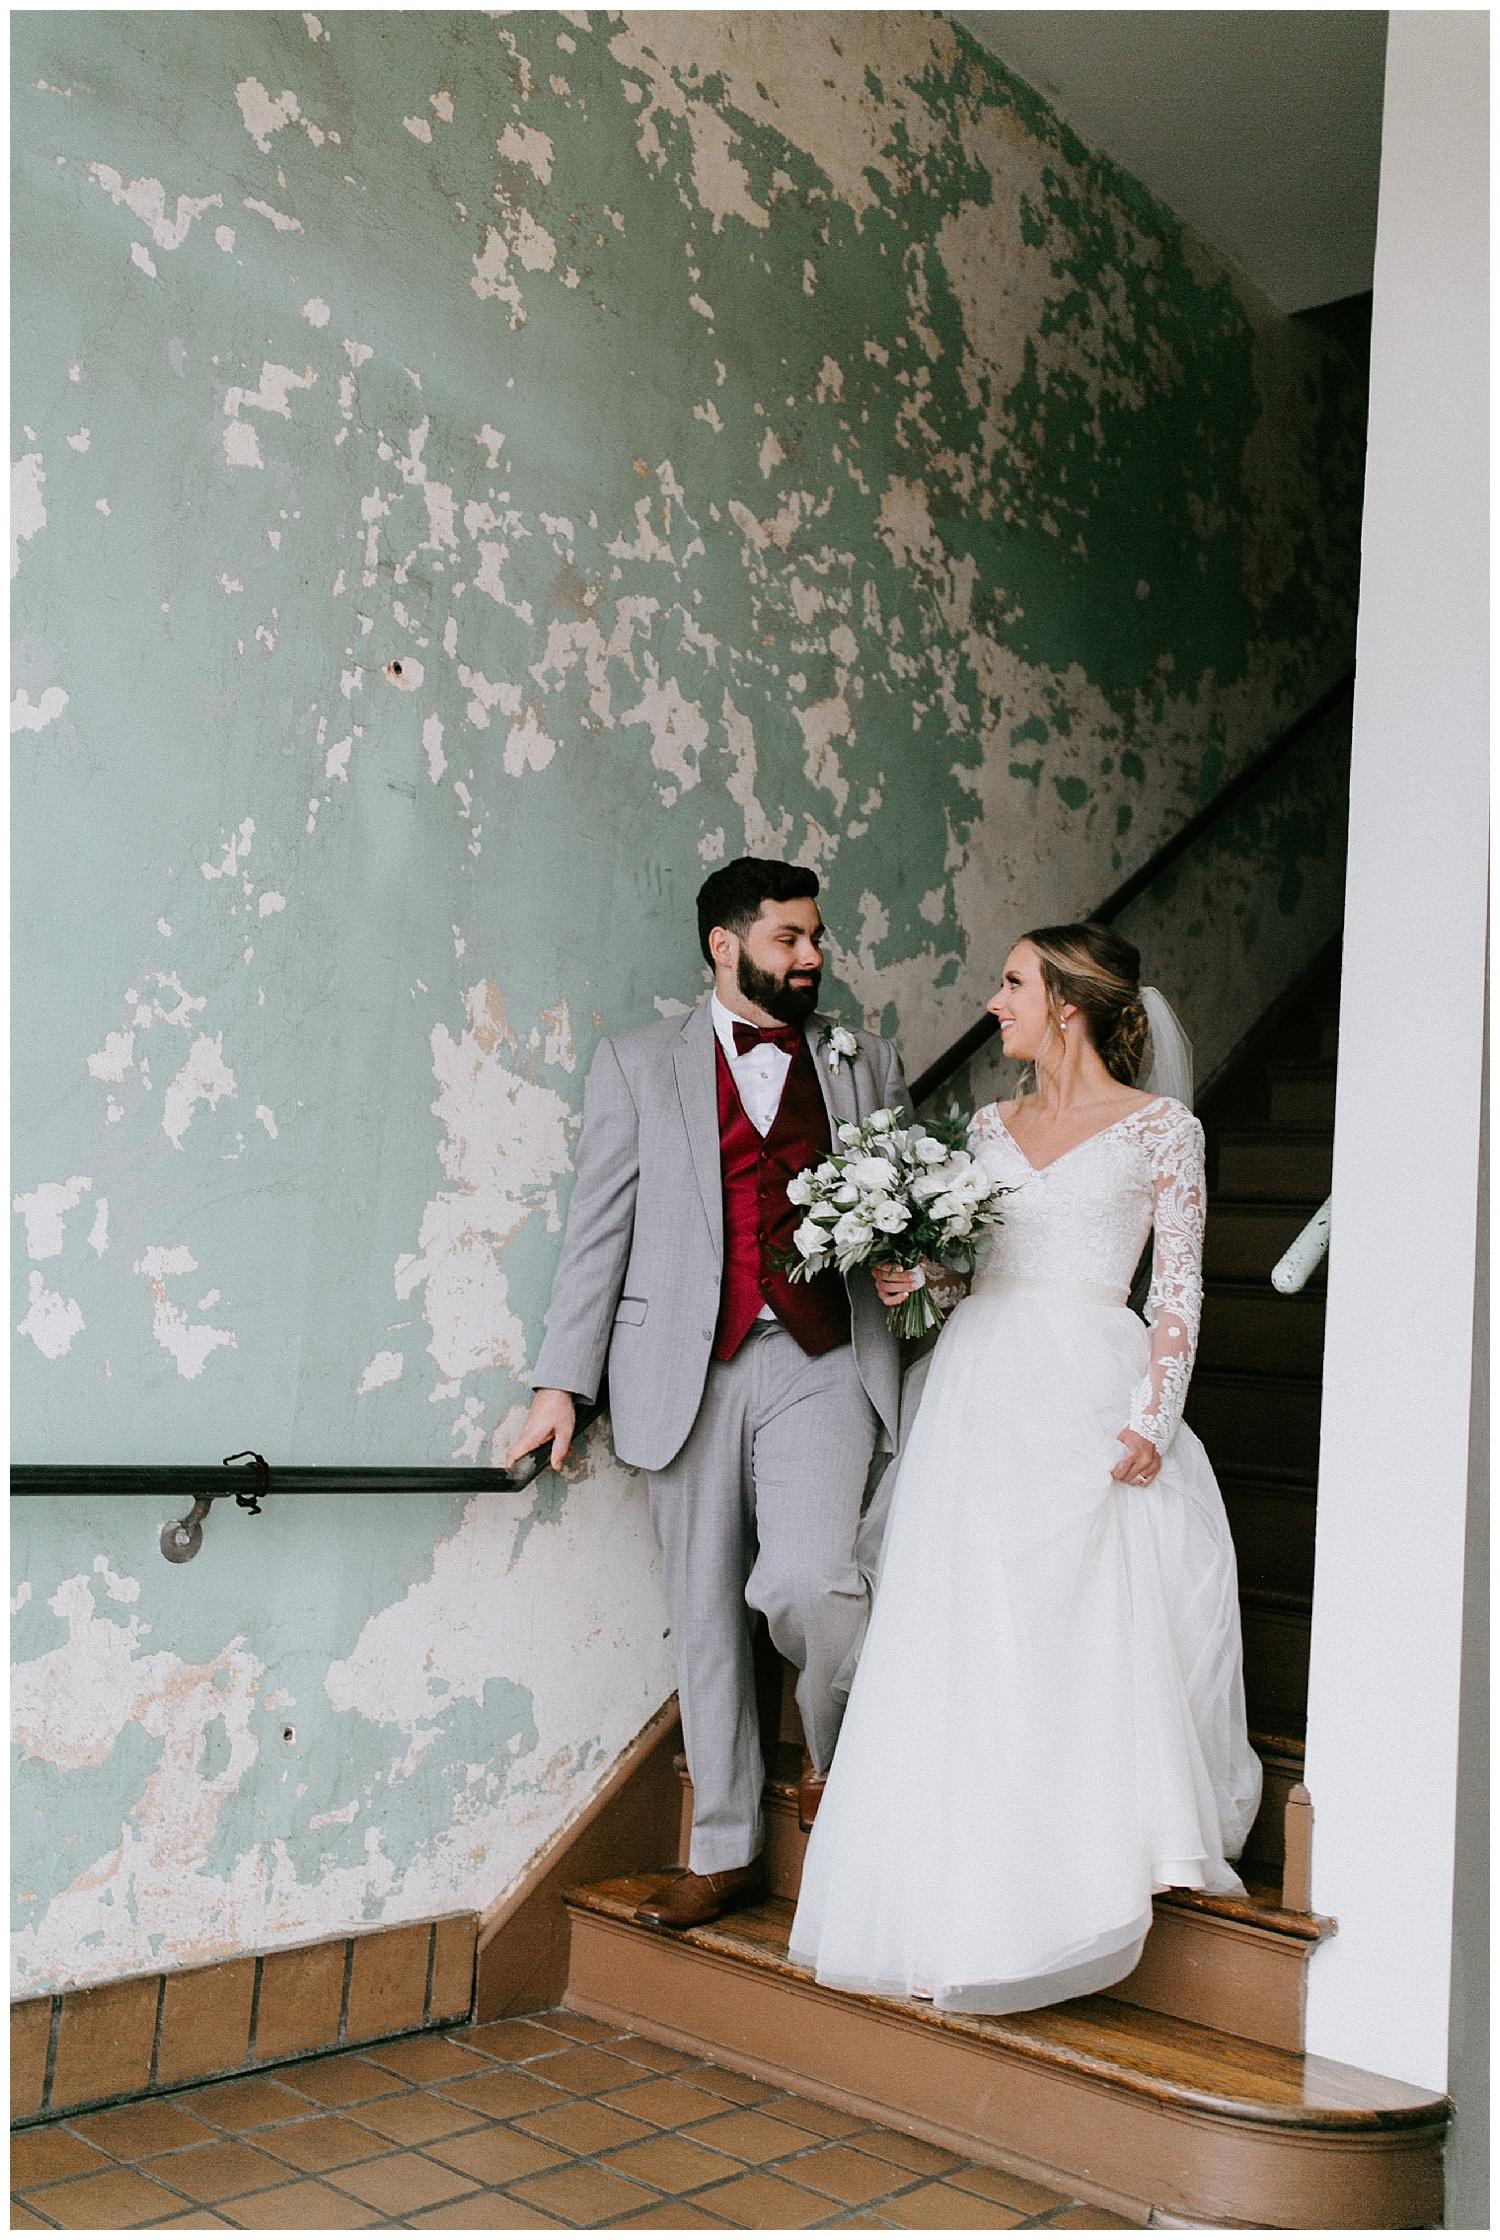 winter-wedding-the standard-knoxville_2019-01-23_0041.jpg